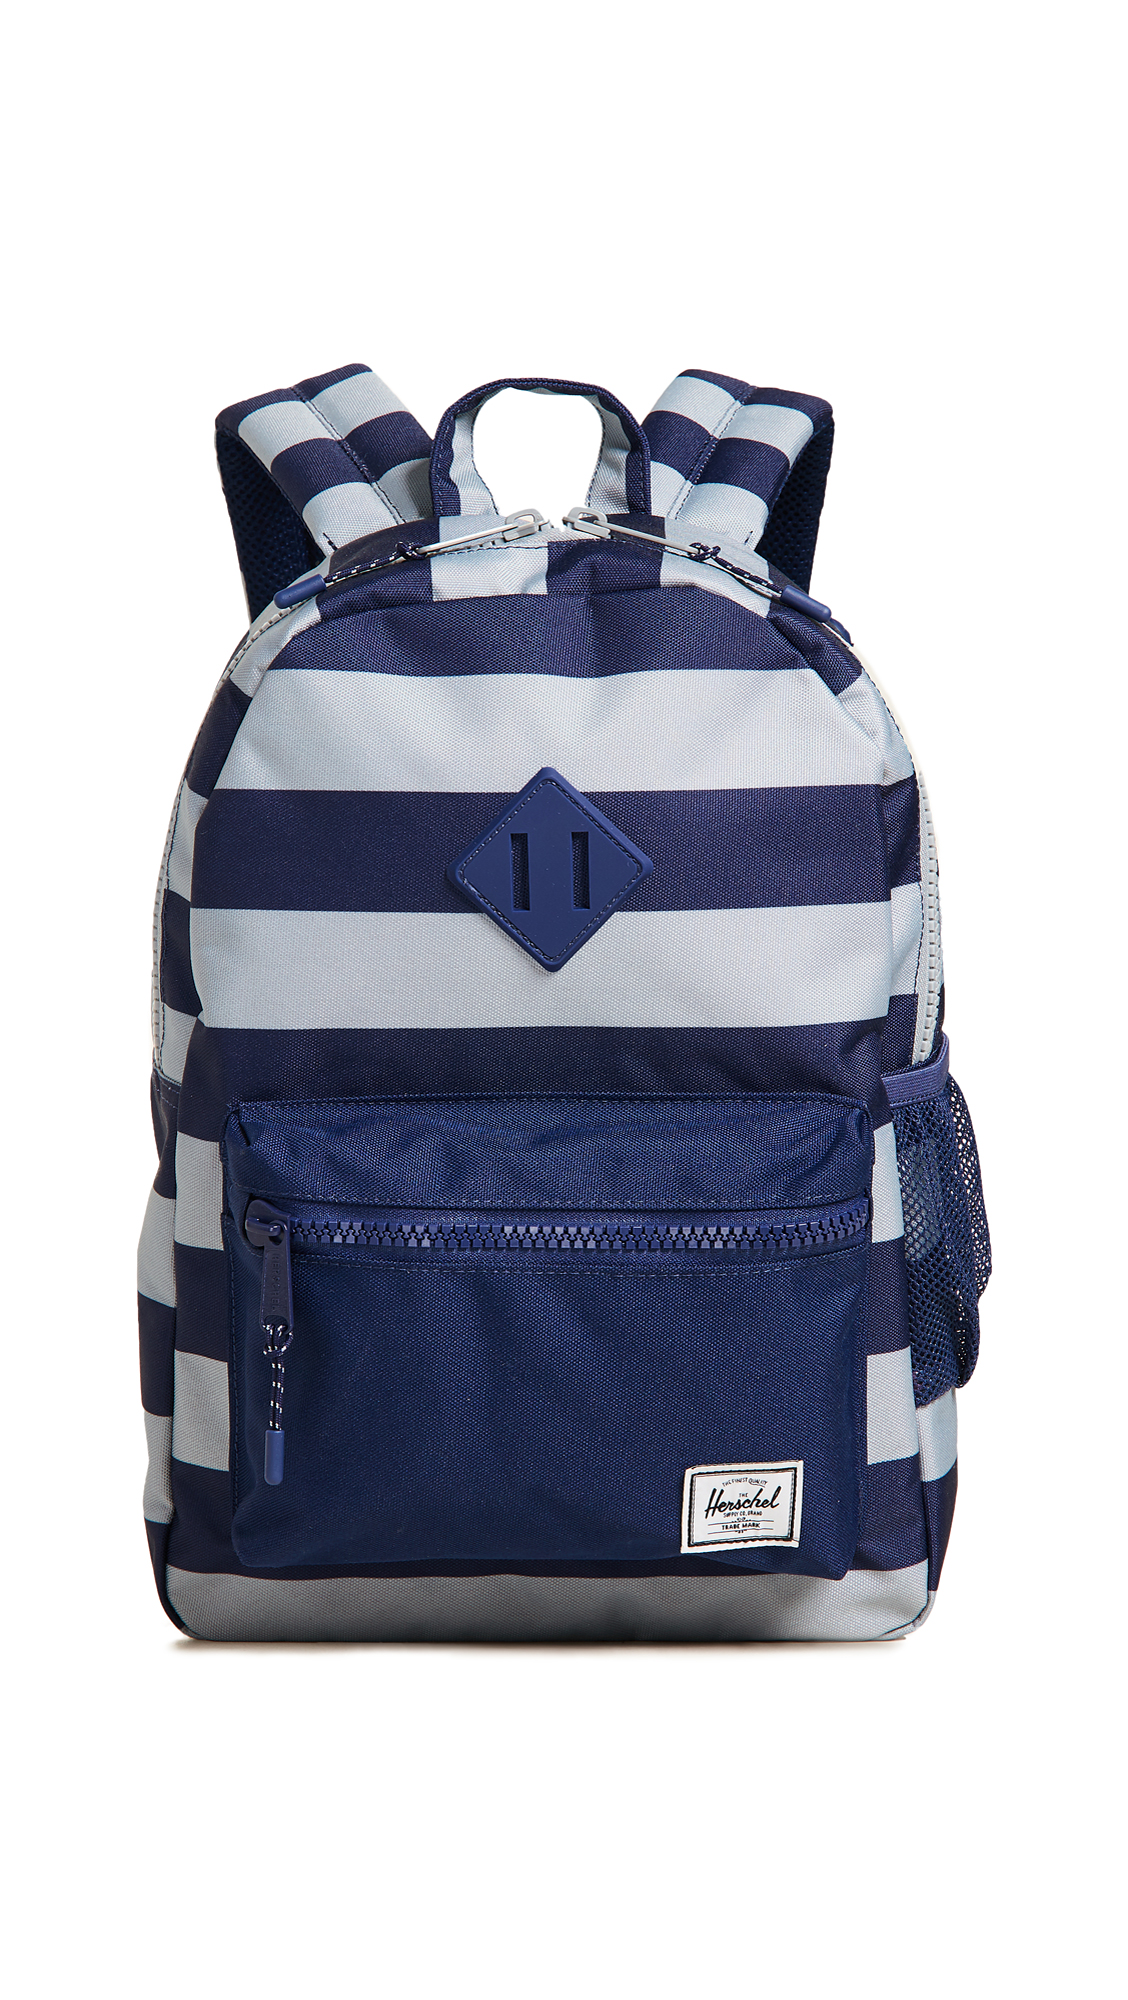 Herschel Supply Co. Heritage Youth Backpack - Quarry/Blueprint Stripe/Blue